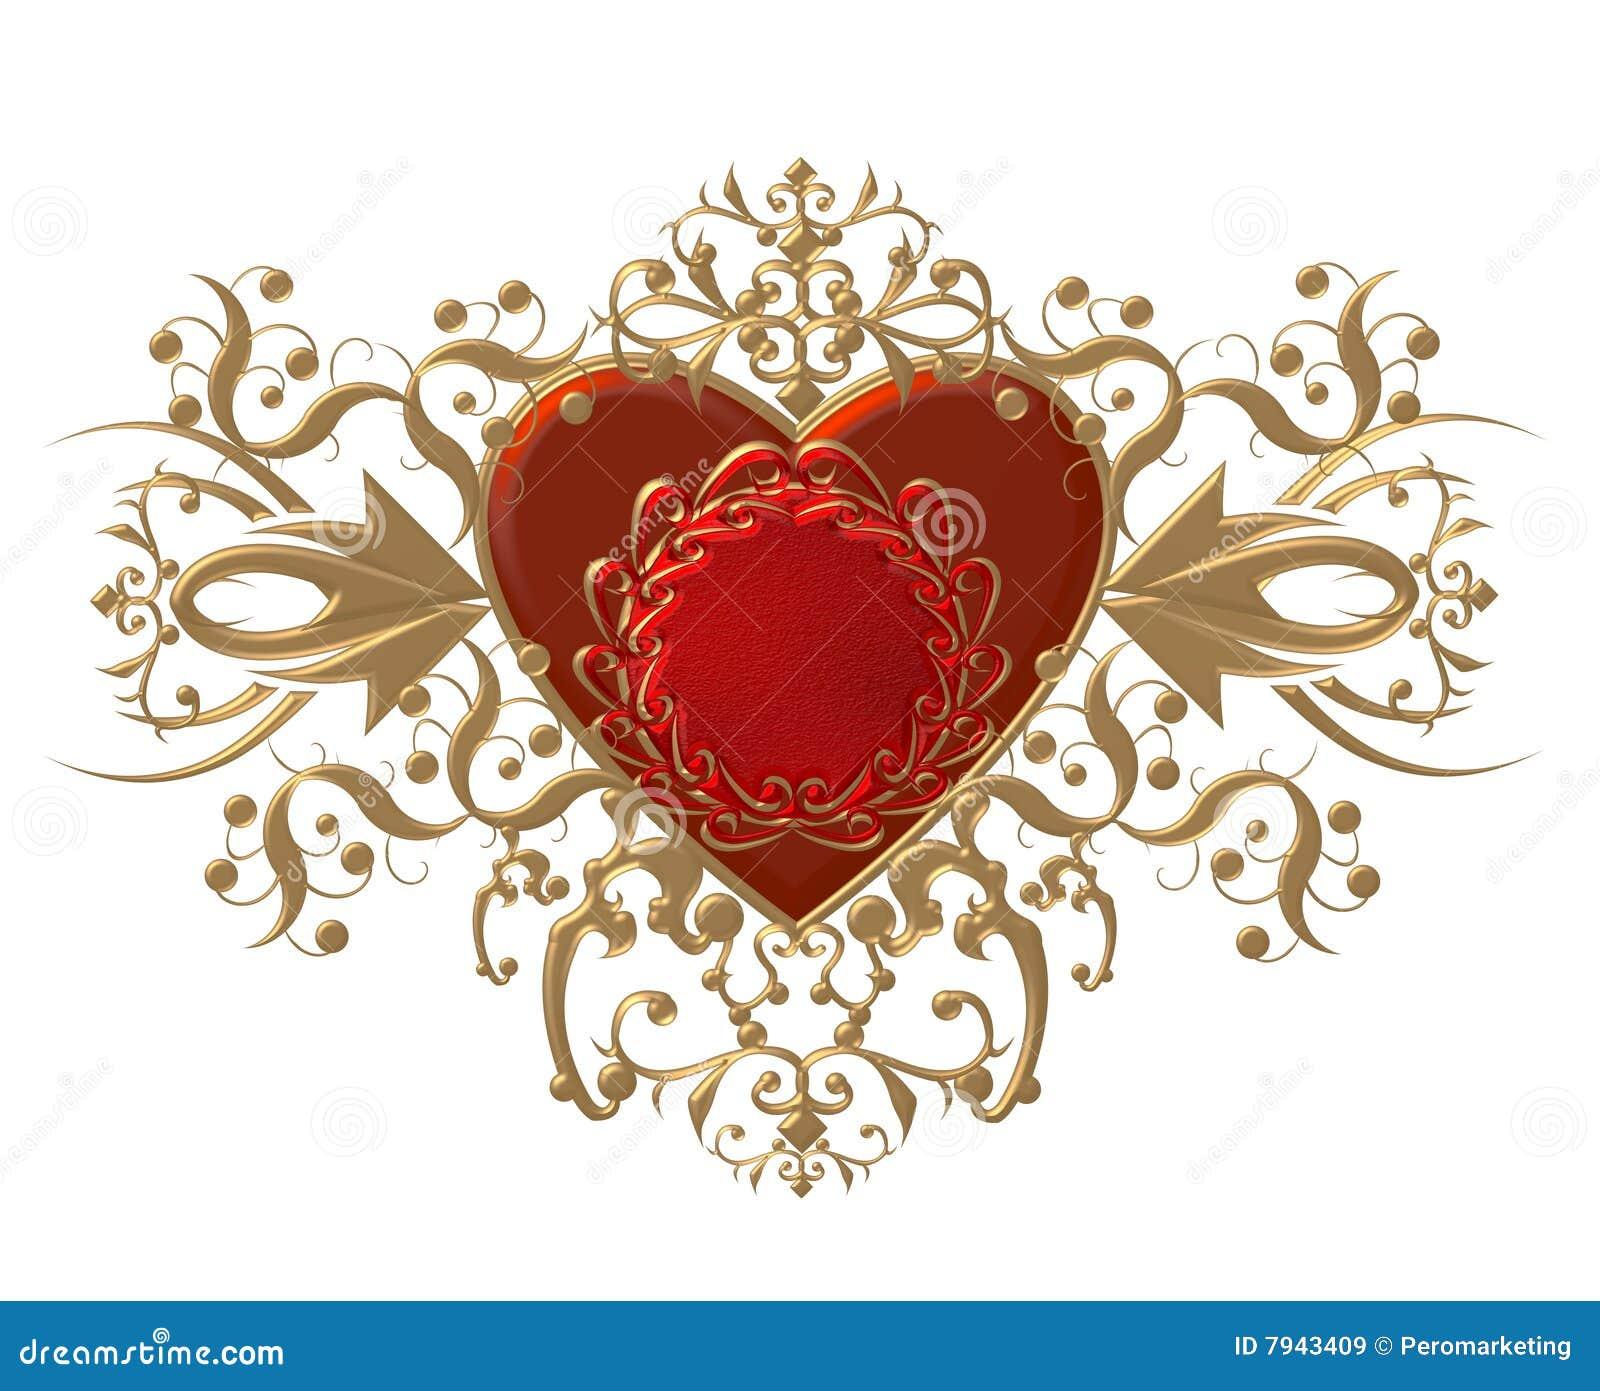 Fancy Red Heart Illustration Stock Illustration ...